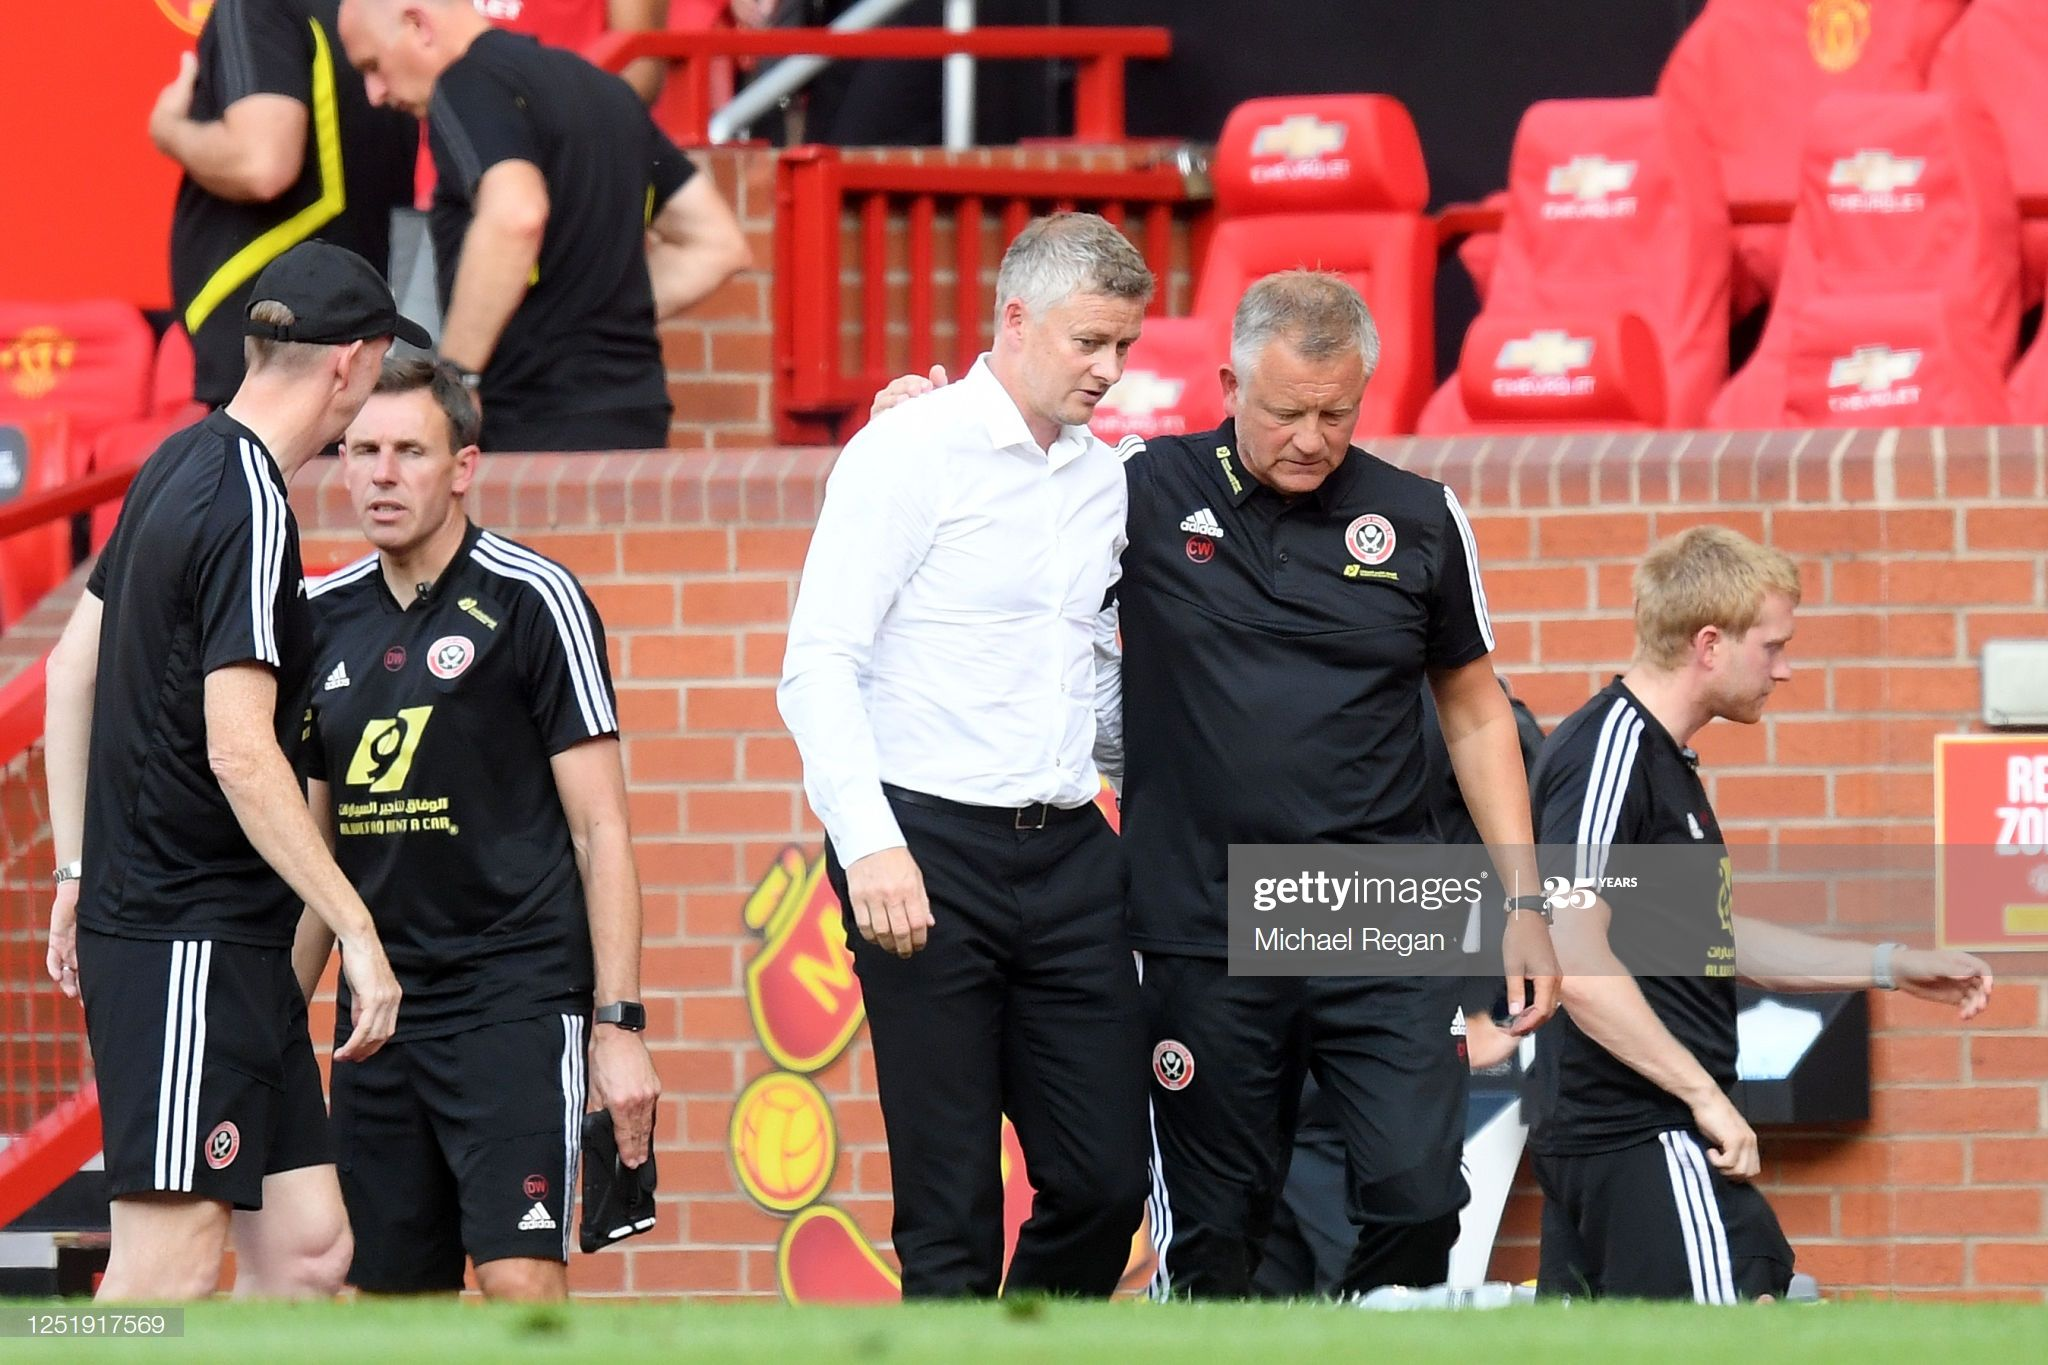 Ole Gunnar Solskjaer Manager Of Manchester United Interacts With In 2020 Ole Gunnar Solskjaer Manchester United Premier League Matches